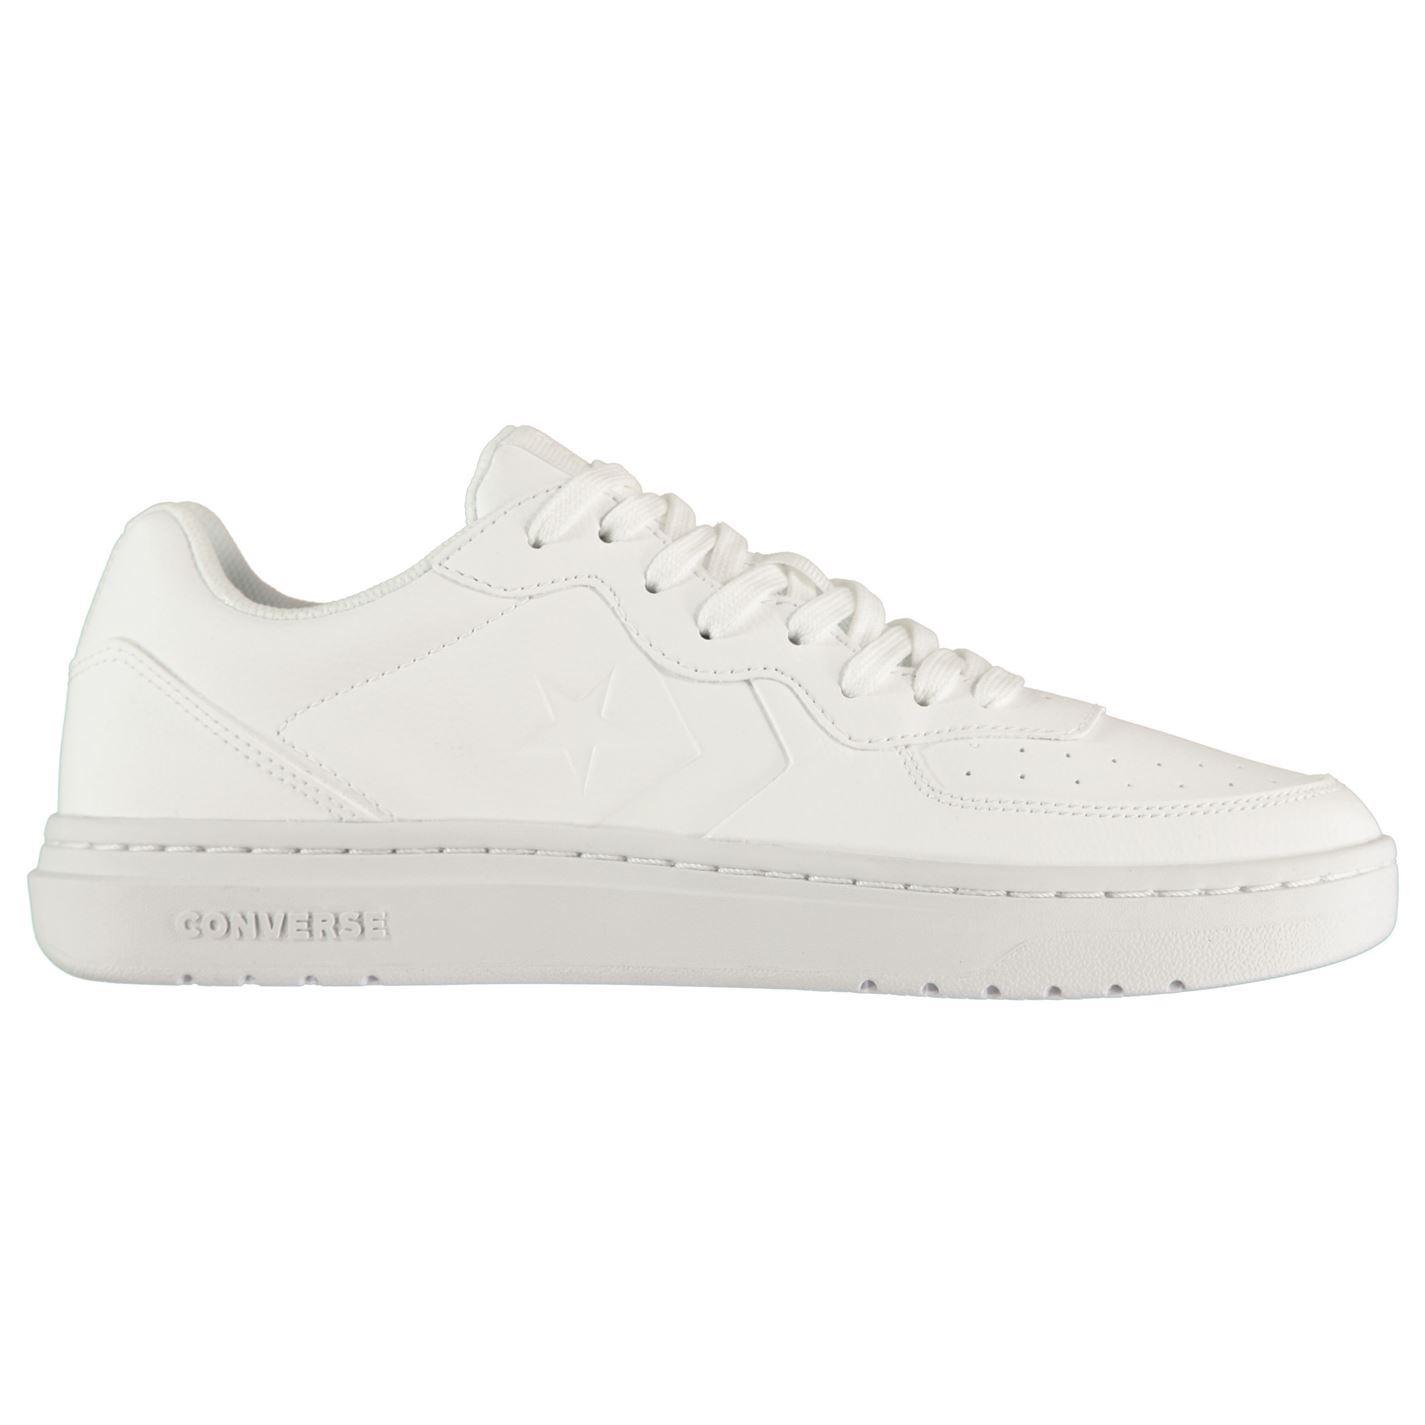 Converse-Ox-Rival-Cuir-Baskets-Pour-Homme-Chaussures-De-Loisirs-Chaussures-Baskets miniature 15